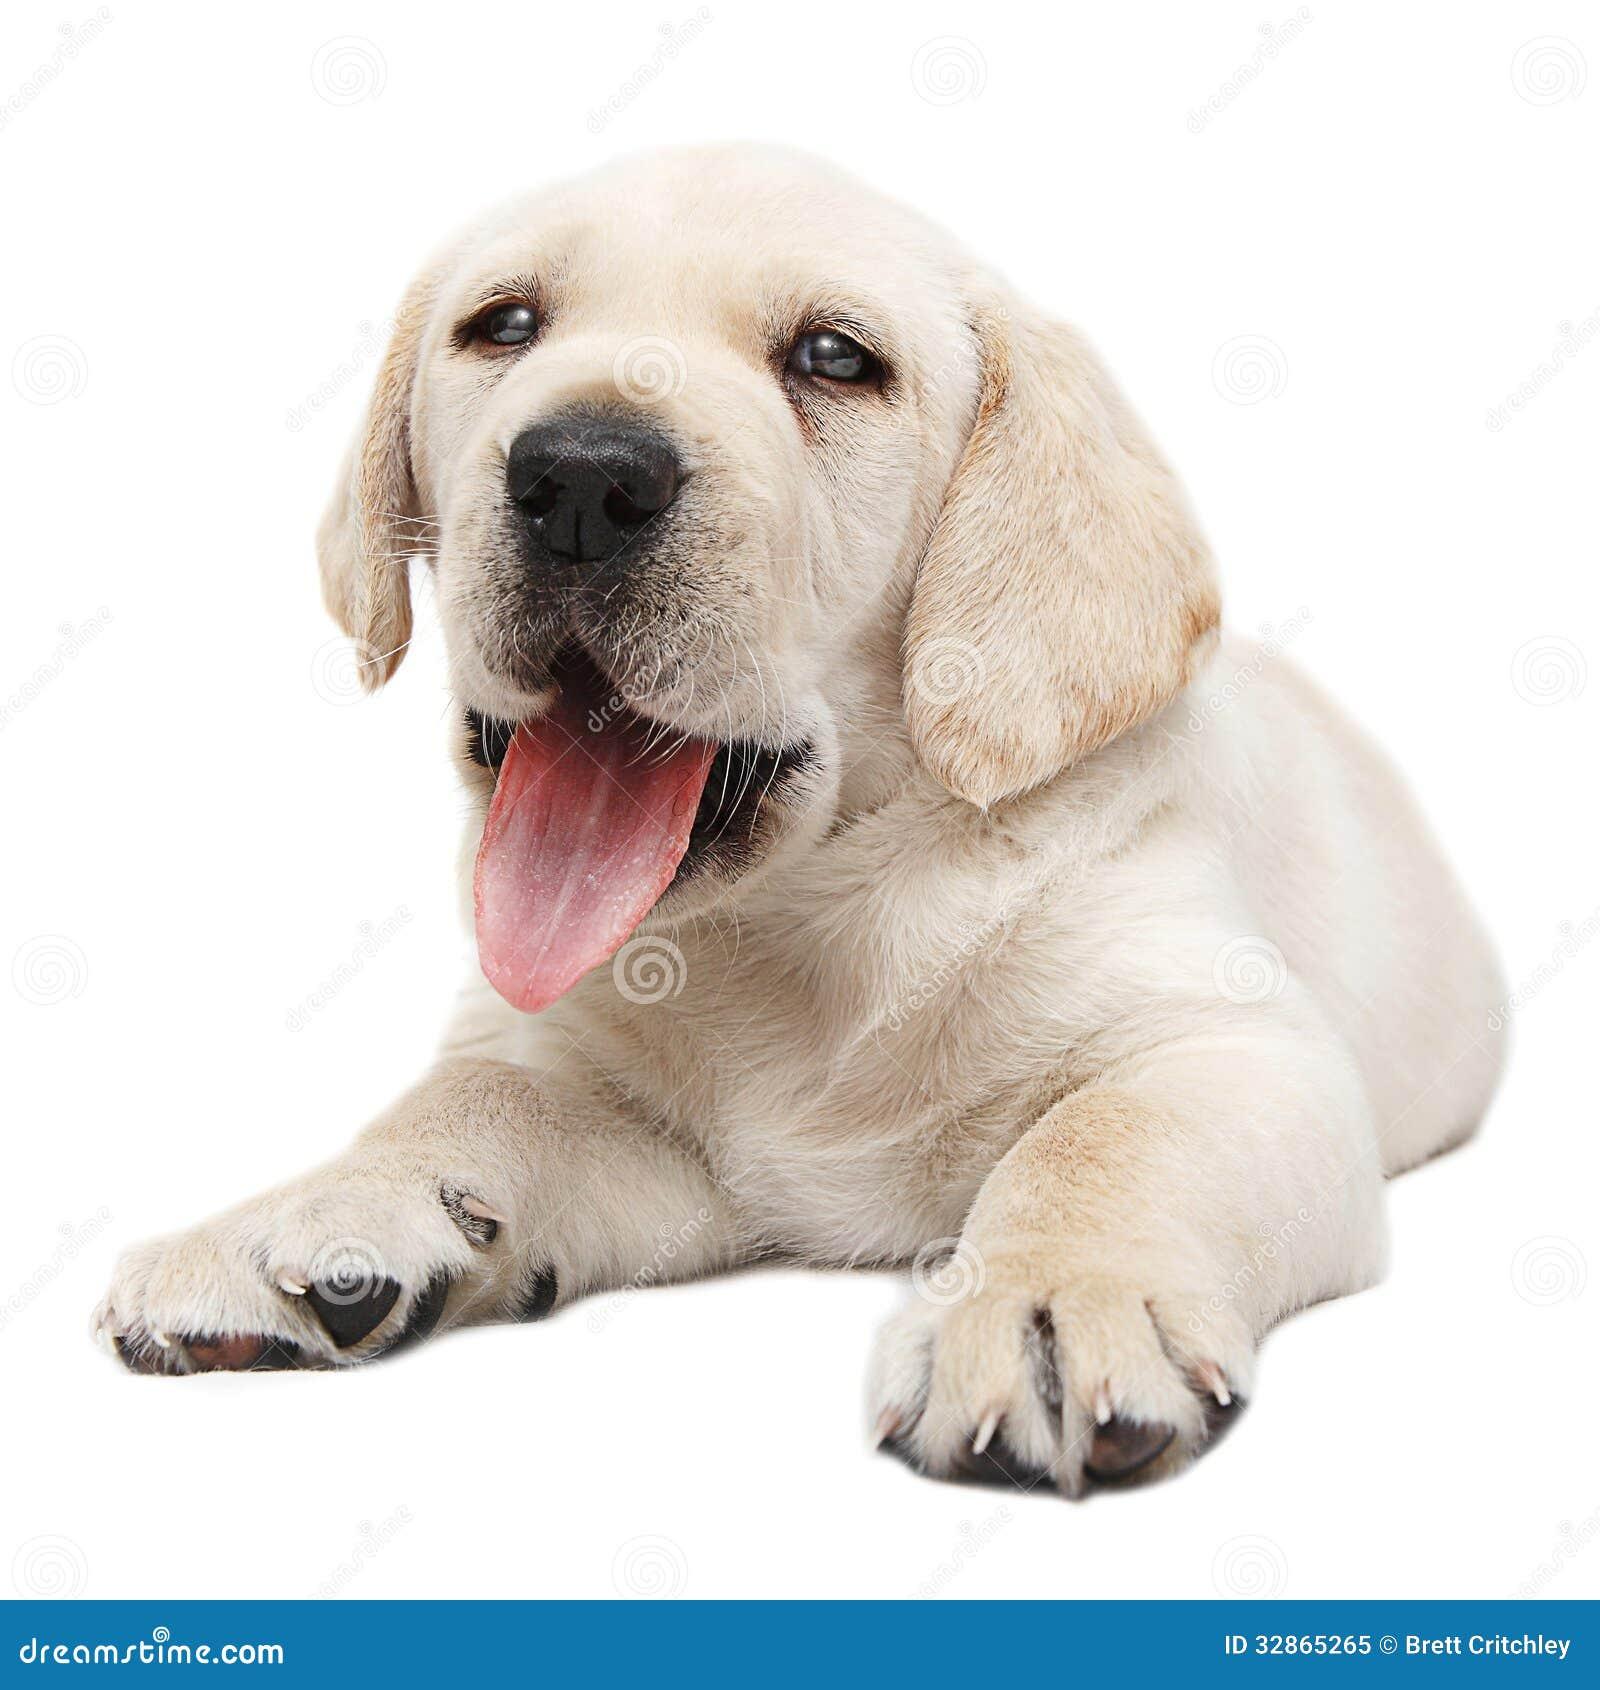 Panting Puppy Dog Stock Image Image Of Panting Pants 32865265